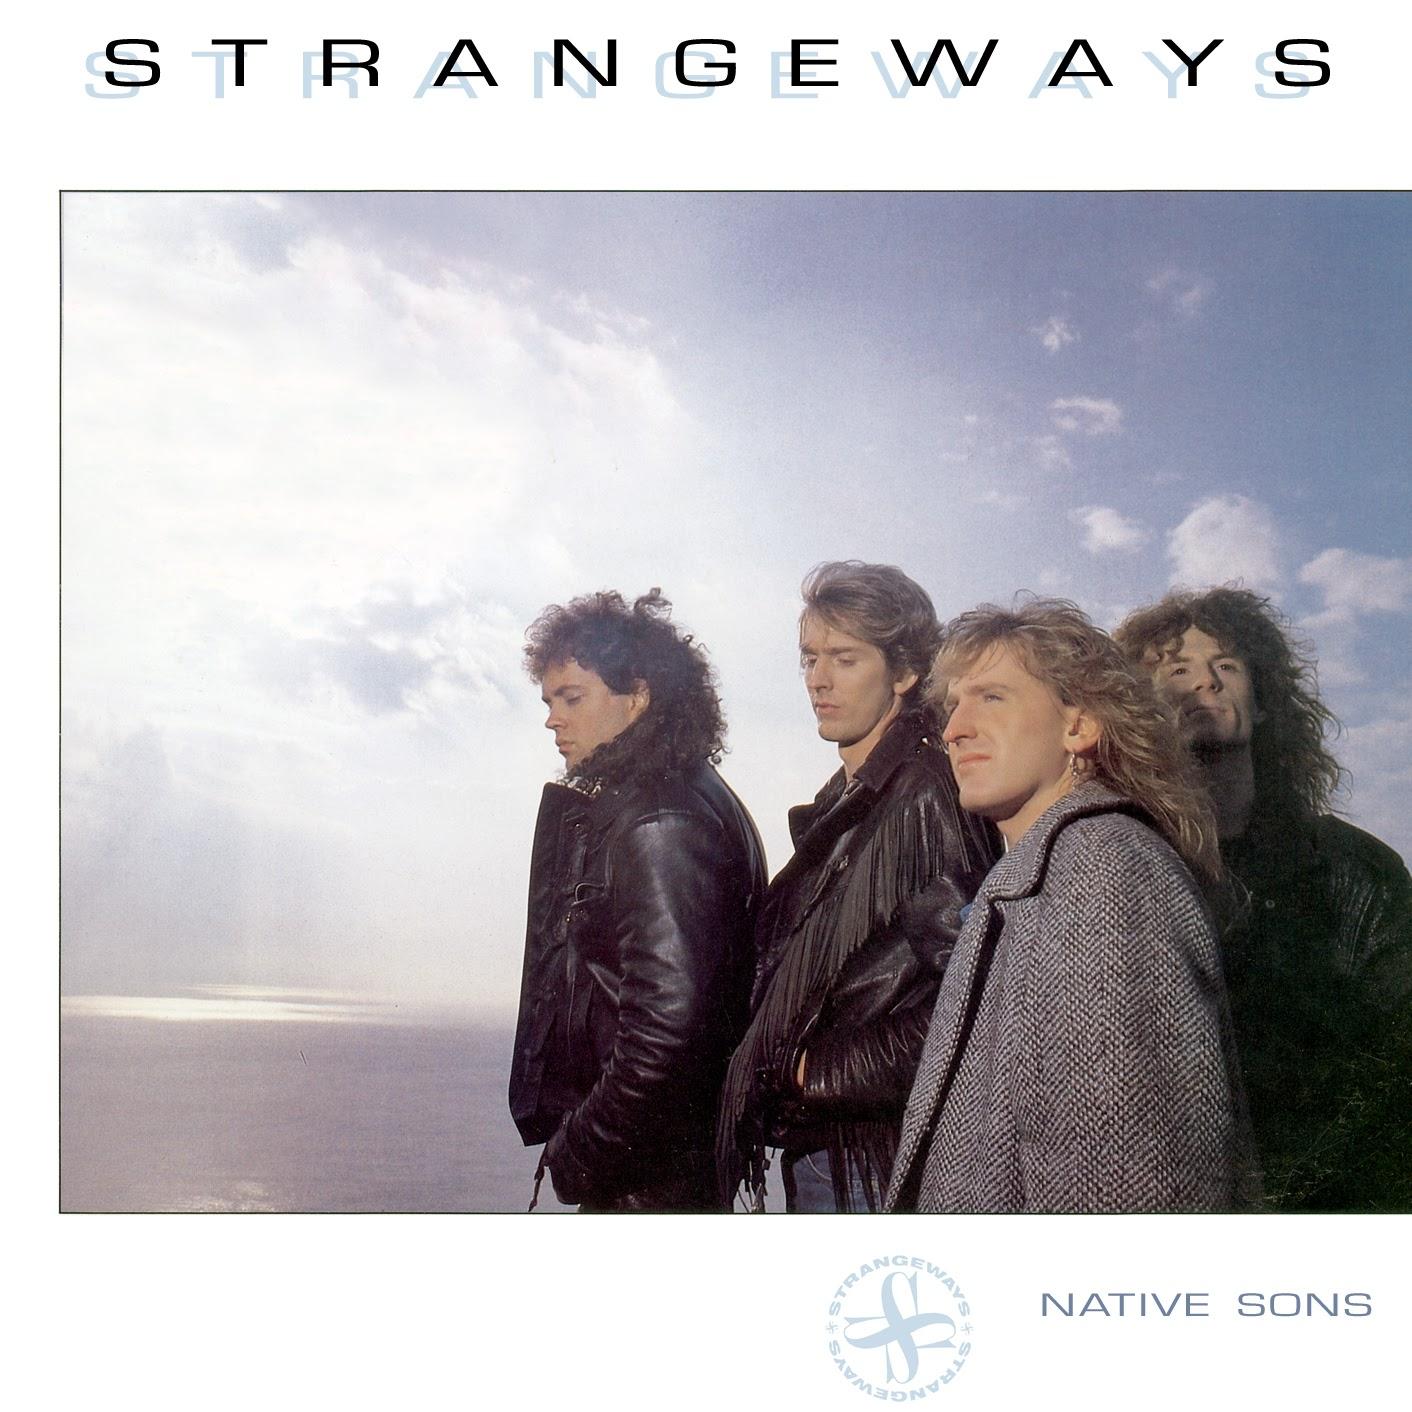 Strangeways Native sons 1987 aor melodic rock